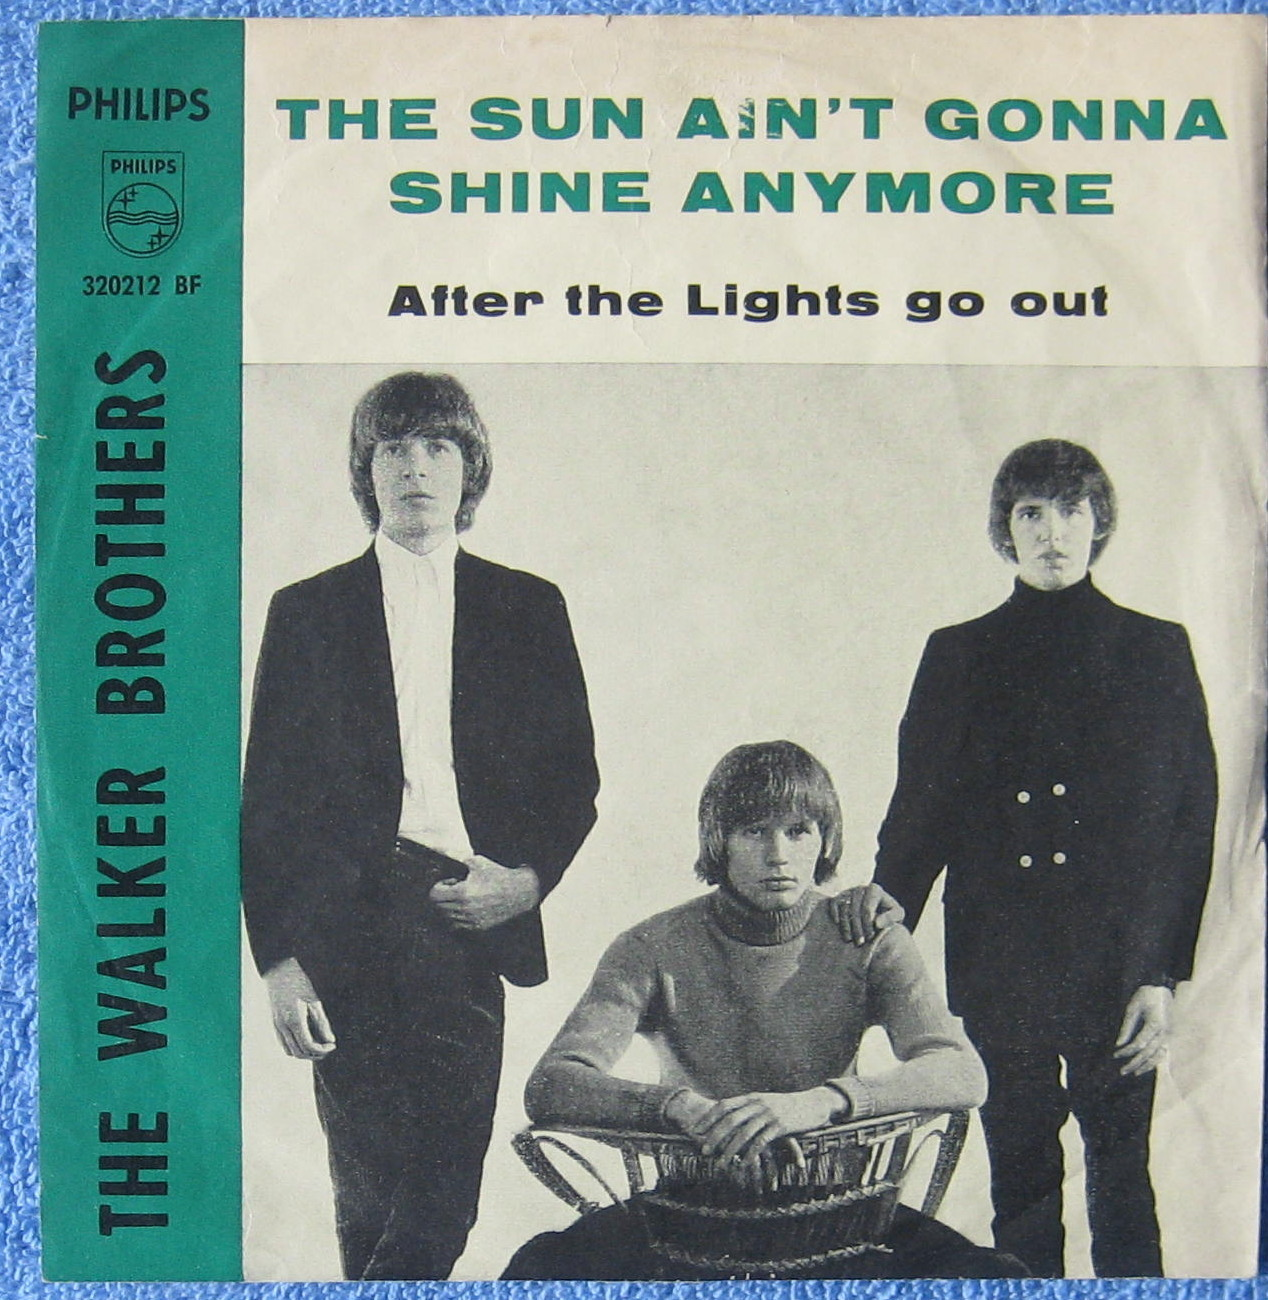 The Sun Ain't Gonna Shine Anymore Lyrics - MetroLyrics